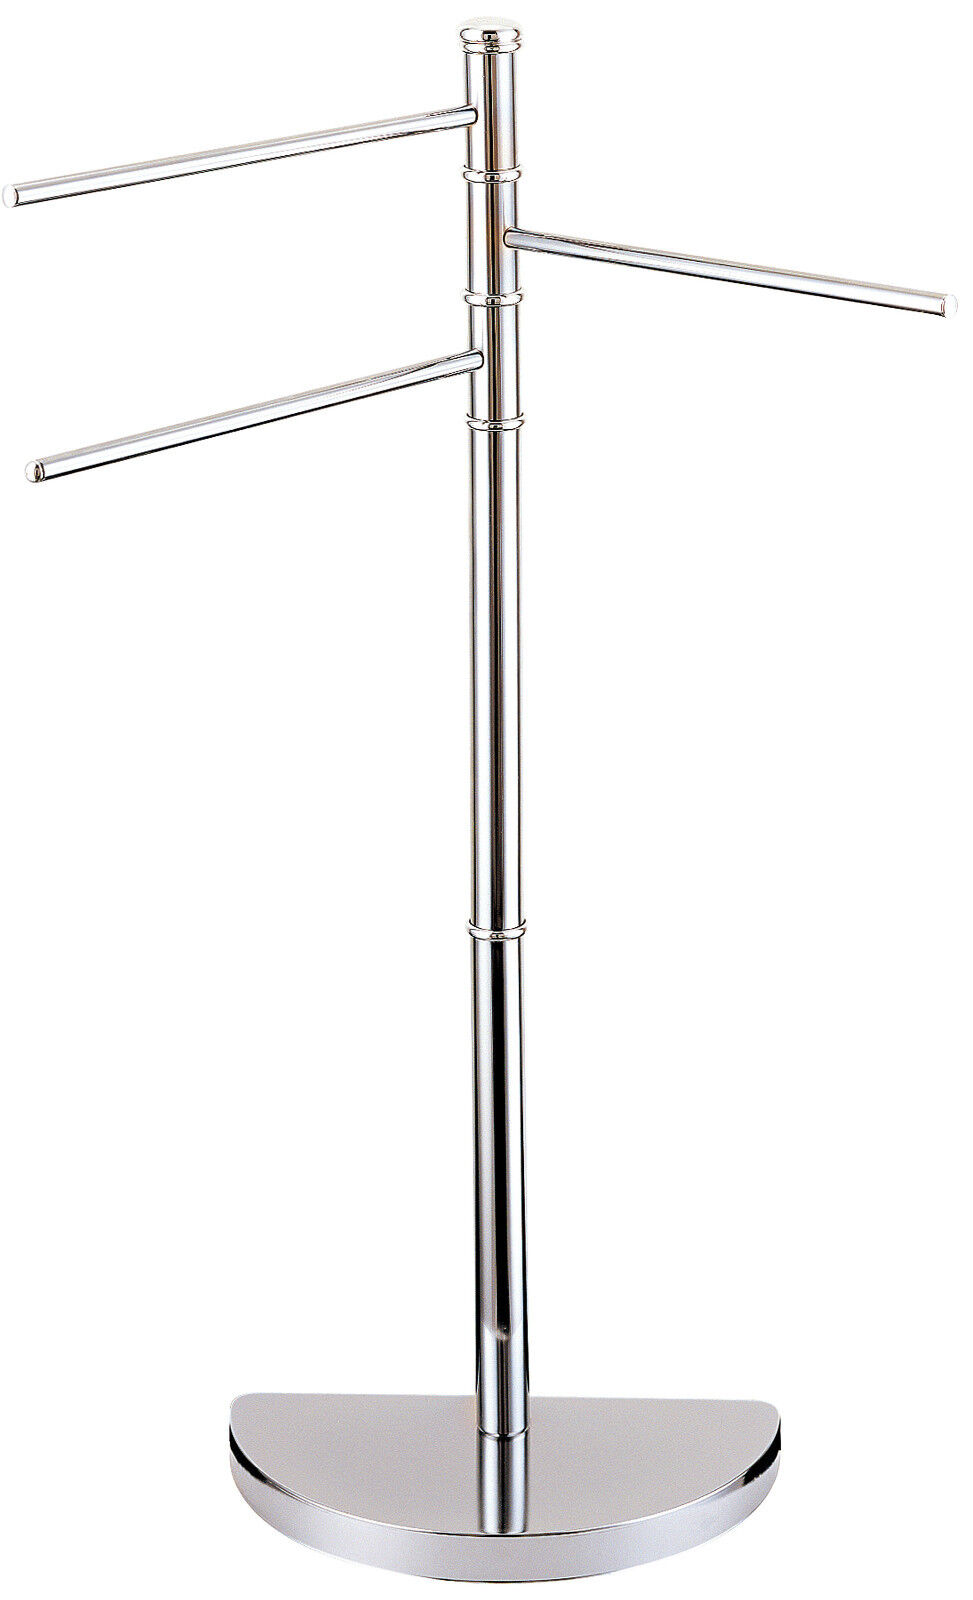 lunar chrome 3 arm free standing bathroom towel rail rack showerdrape ebay. Black Bedroom Furniture Sets. Home Design Ideas